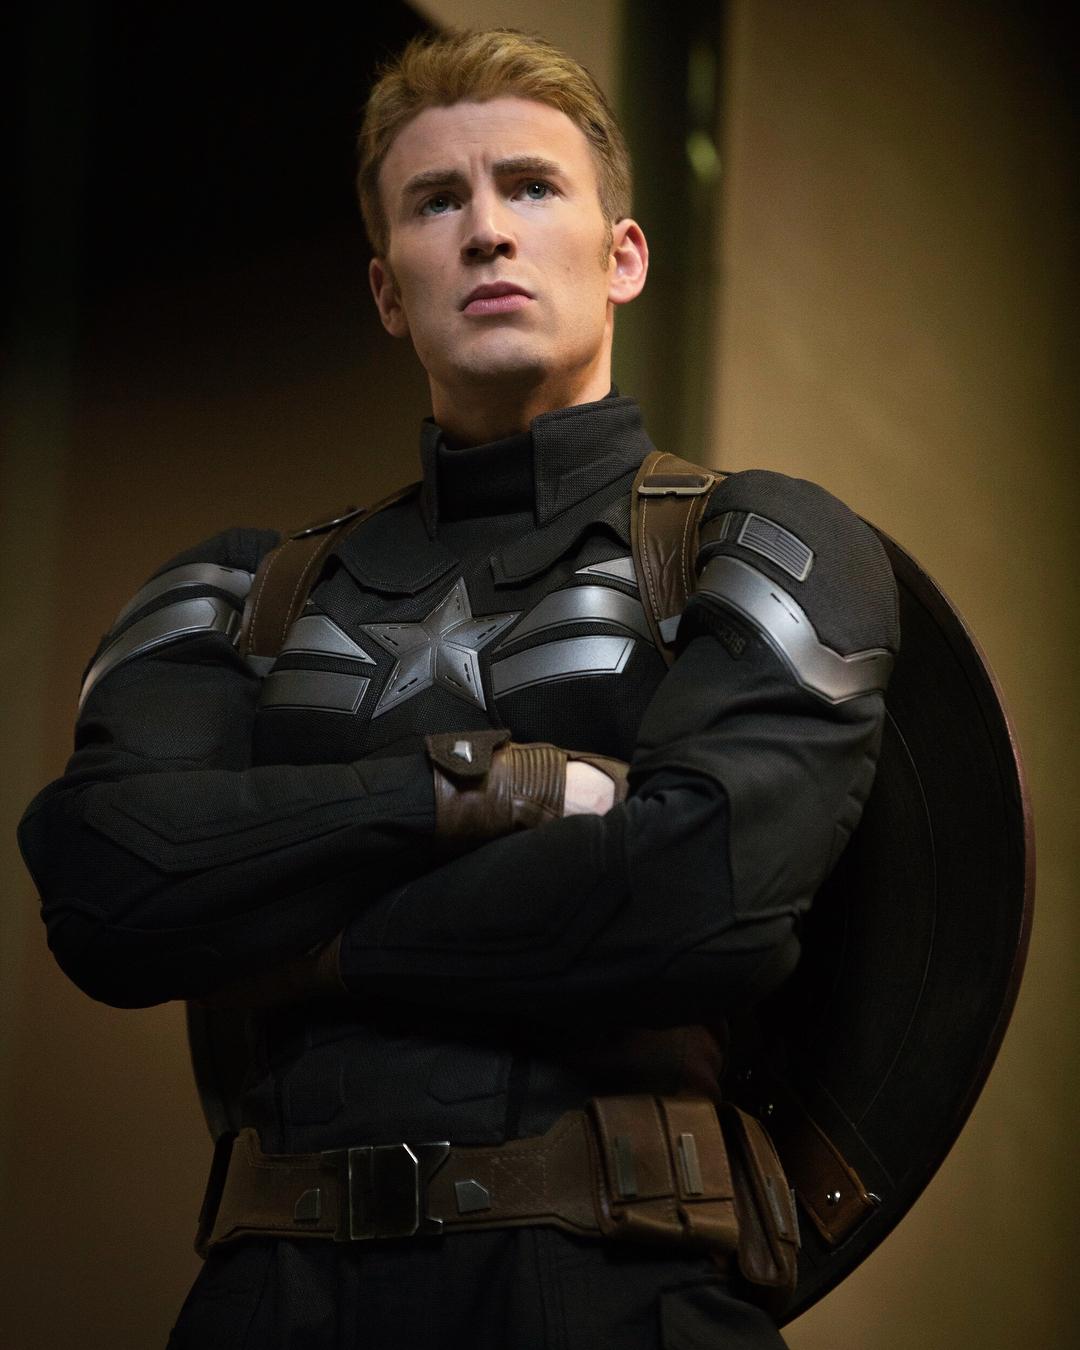 Avengers Infinity War 1 2 images Captain America HD wallpaper 1080x1350